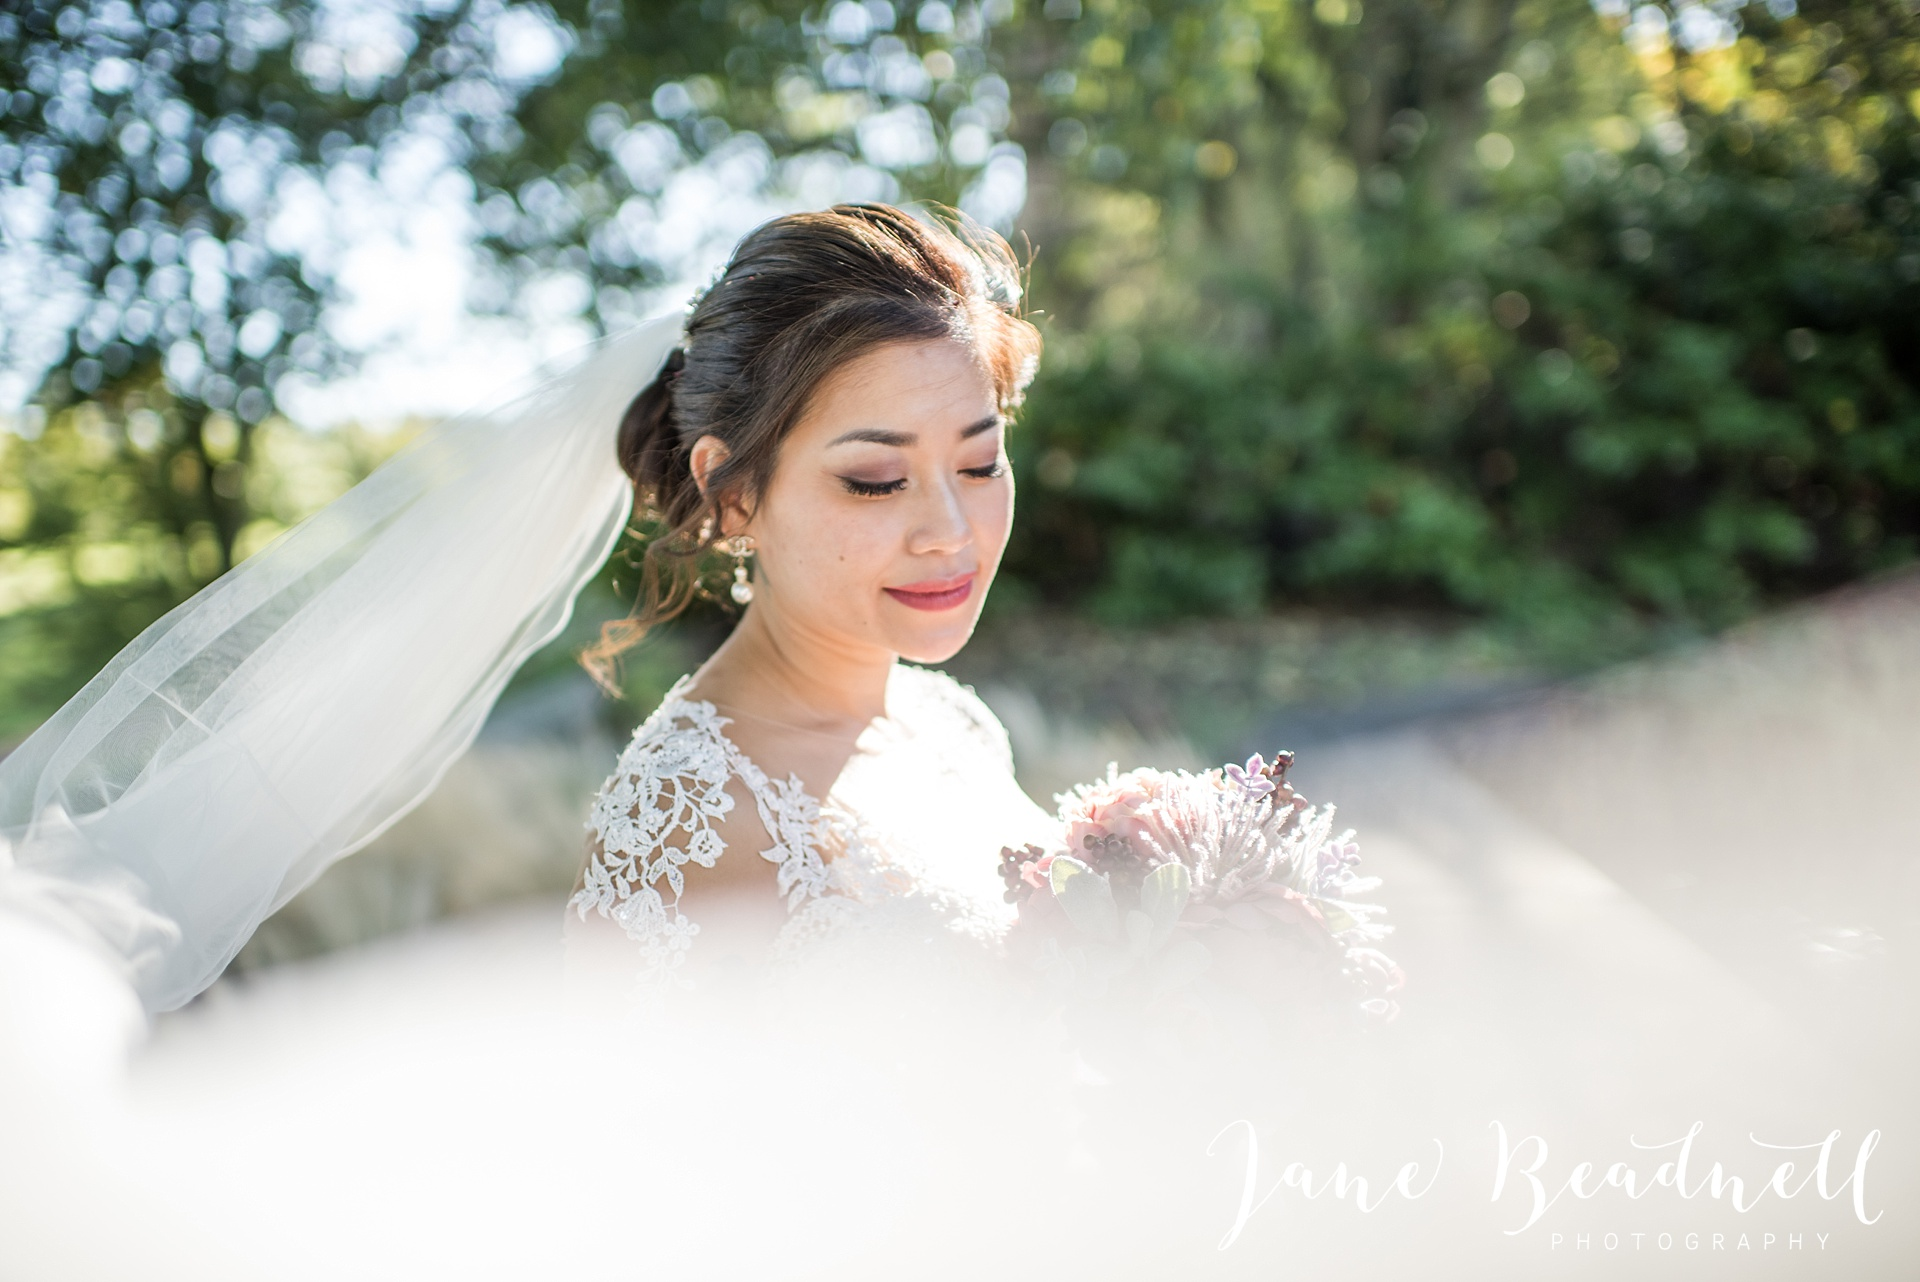 Oulton Hall wedding photography by Yorkshire wedding photographer Jane Beadnell Photography UK and Destination wedding photographer